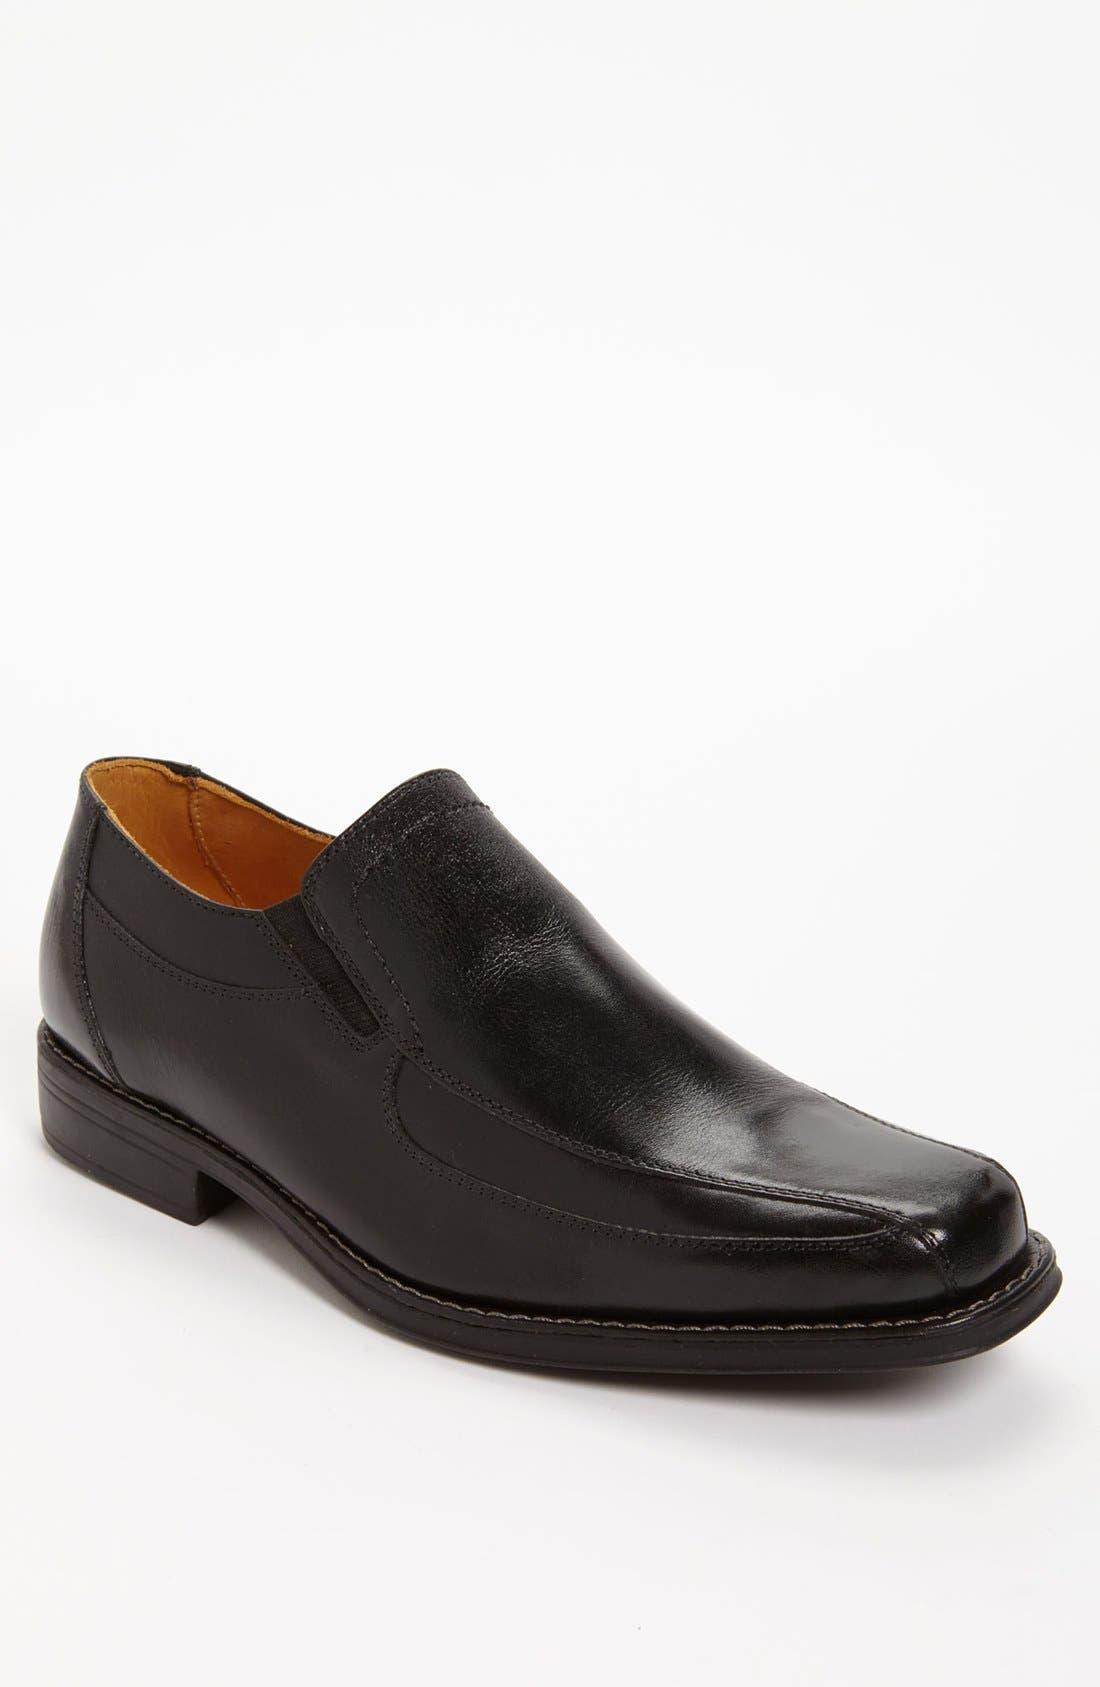 'Berwyn' Venetian Loafer,                             Main thumbnail 1, color,                             BLACK